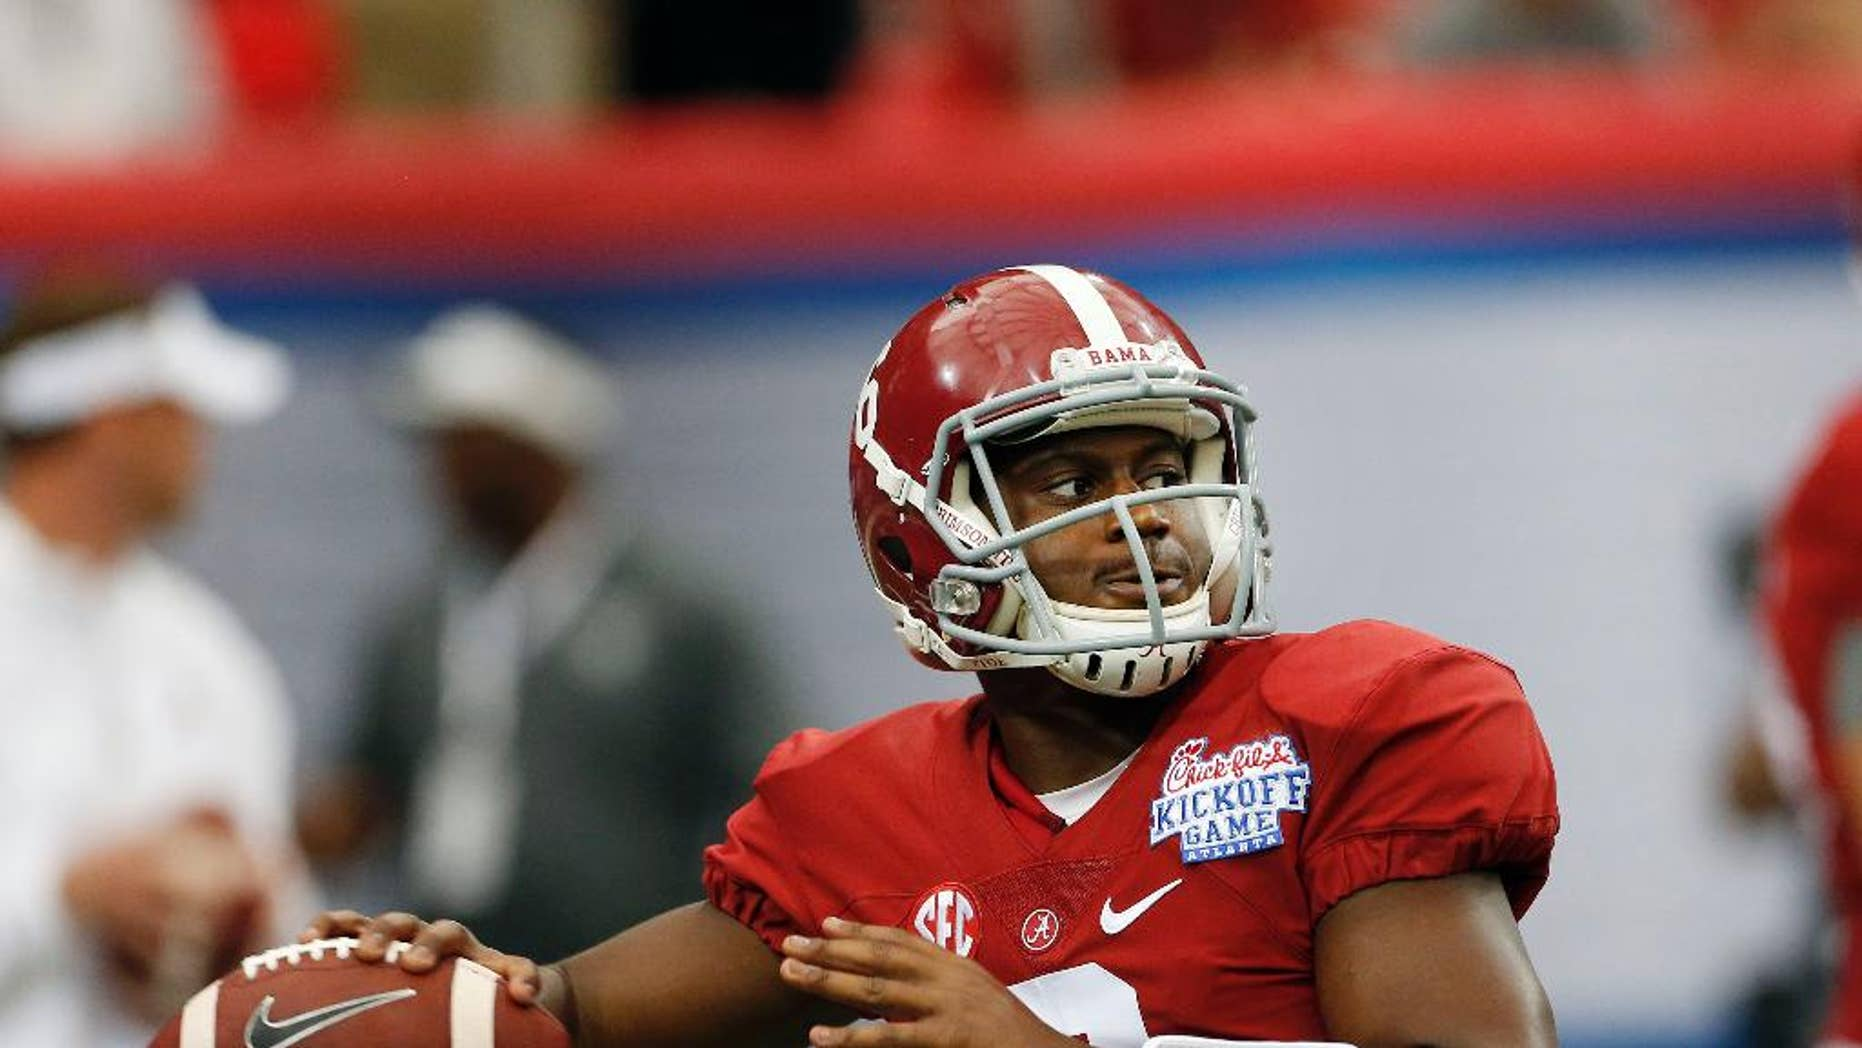 Alabama quarterback Blake Sims (6) warms up before an NCAA college football game against West Virginia Saturday, Aug. 30, 2014, in Atlanta.  (AP Photo/John Bazemore)